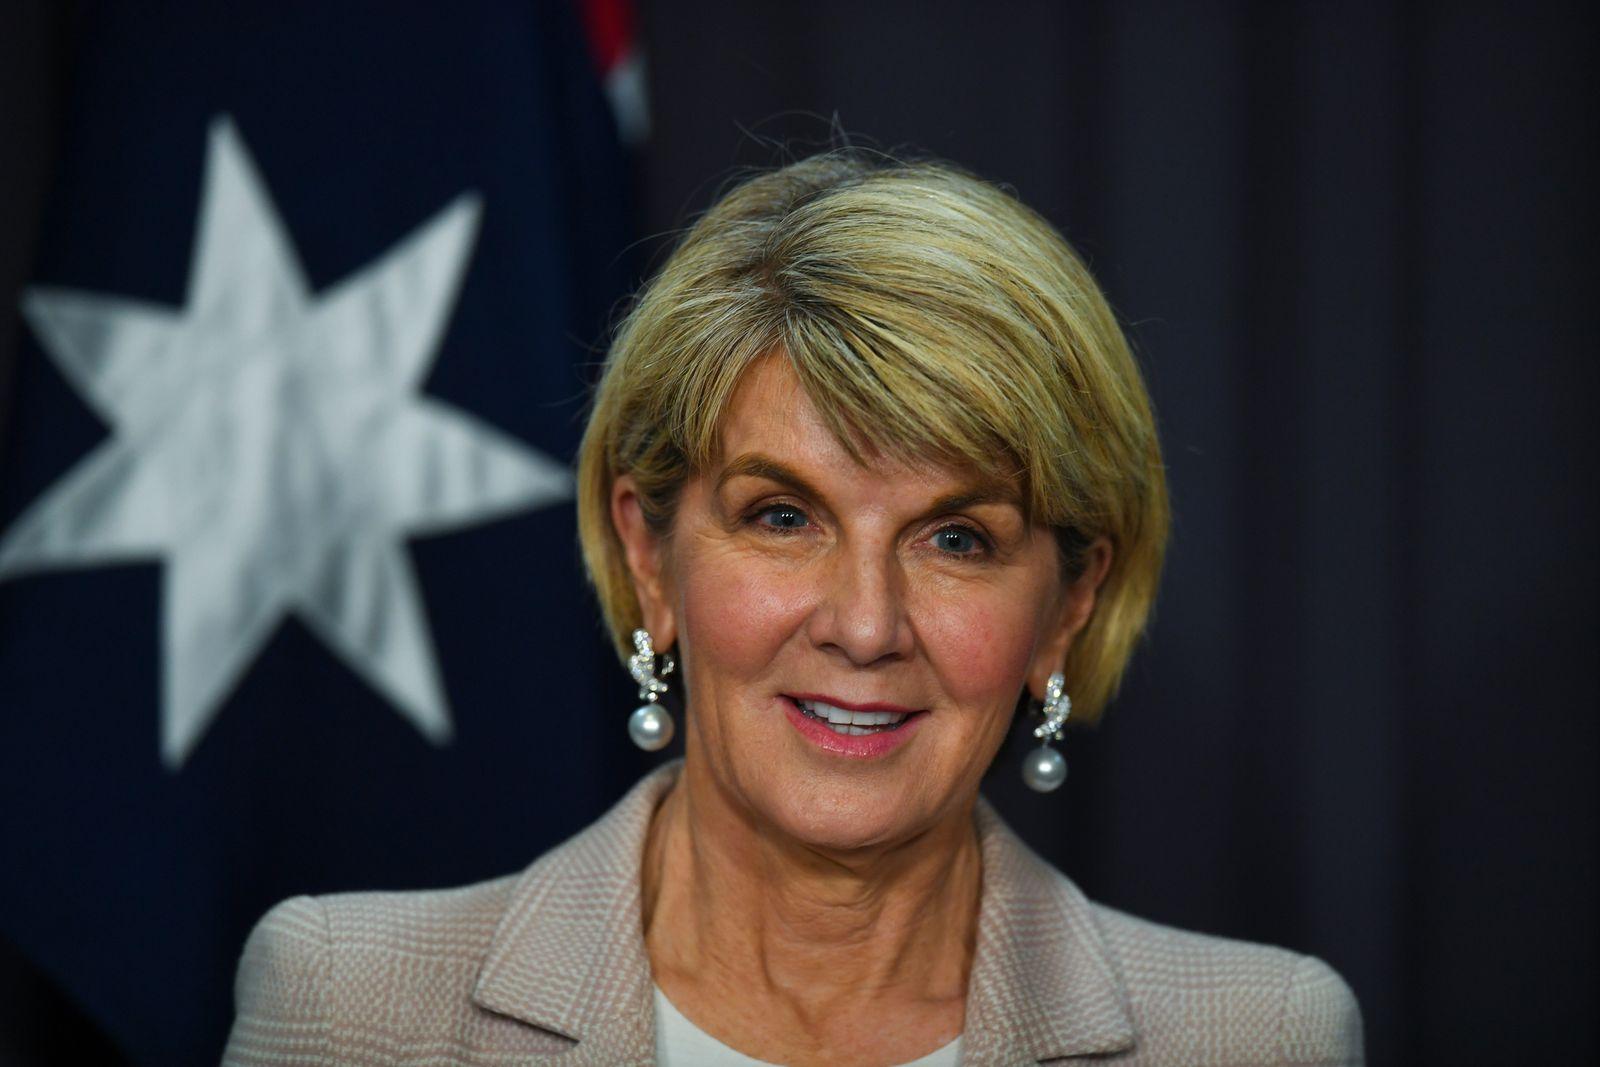 Deputy Prime Minister of New Zealand visits Australia, Canberra - 22 Aug 2018